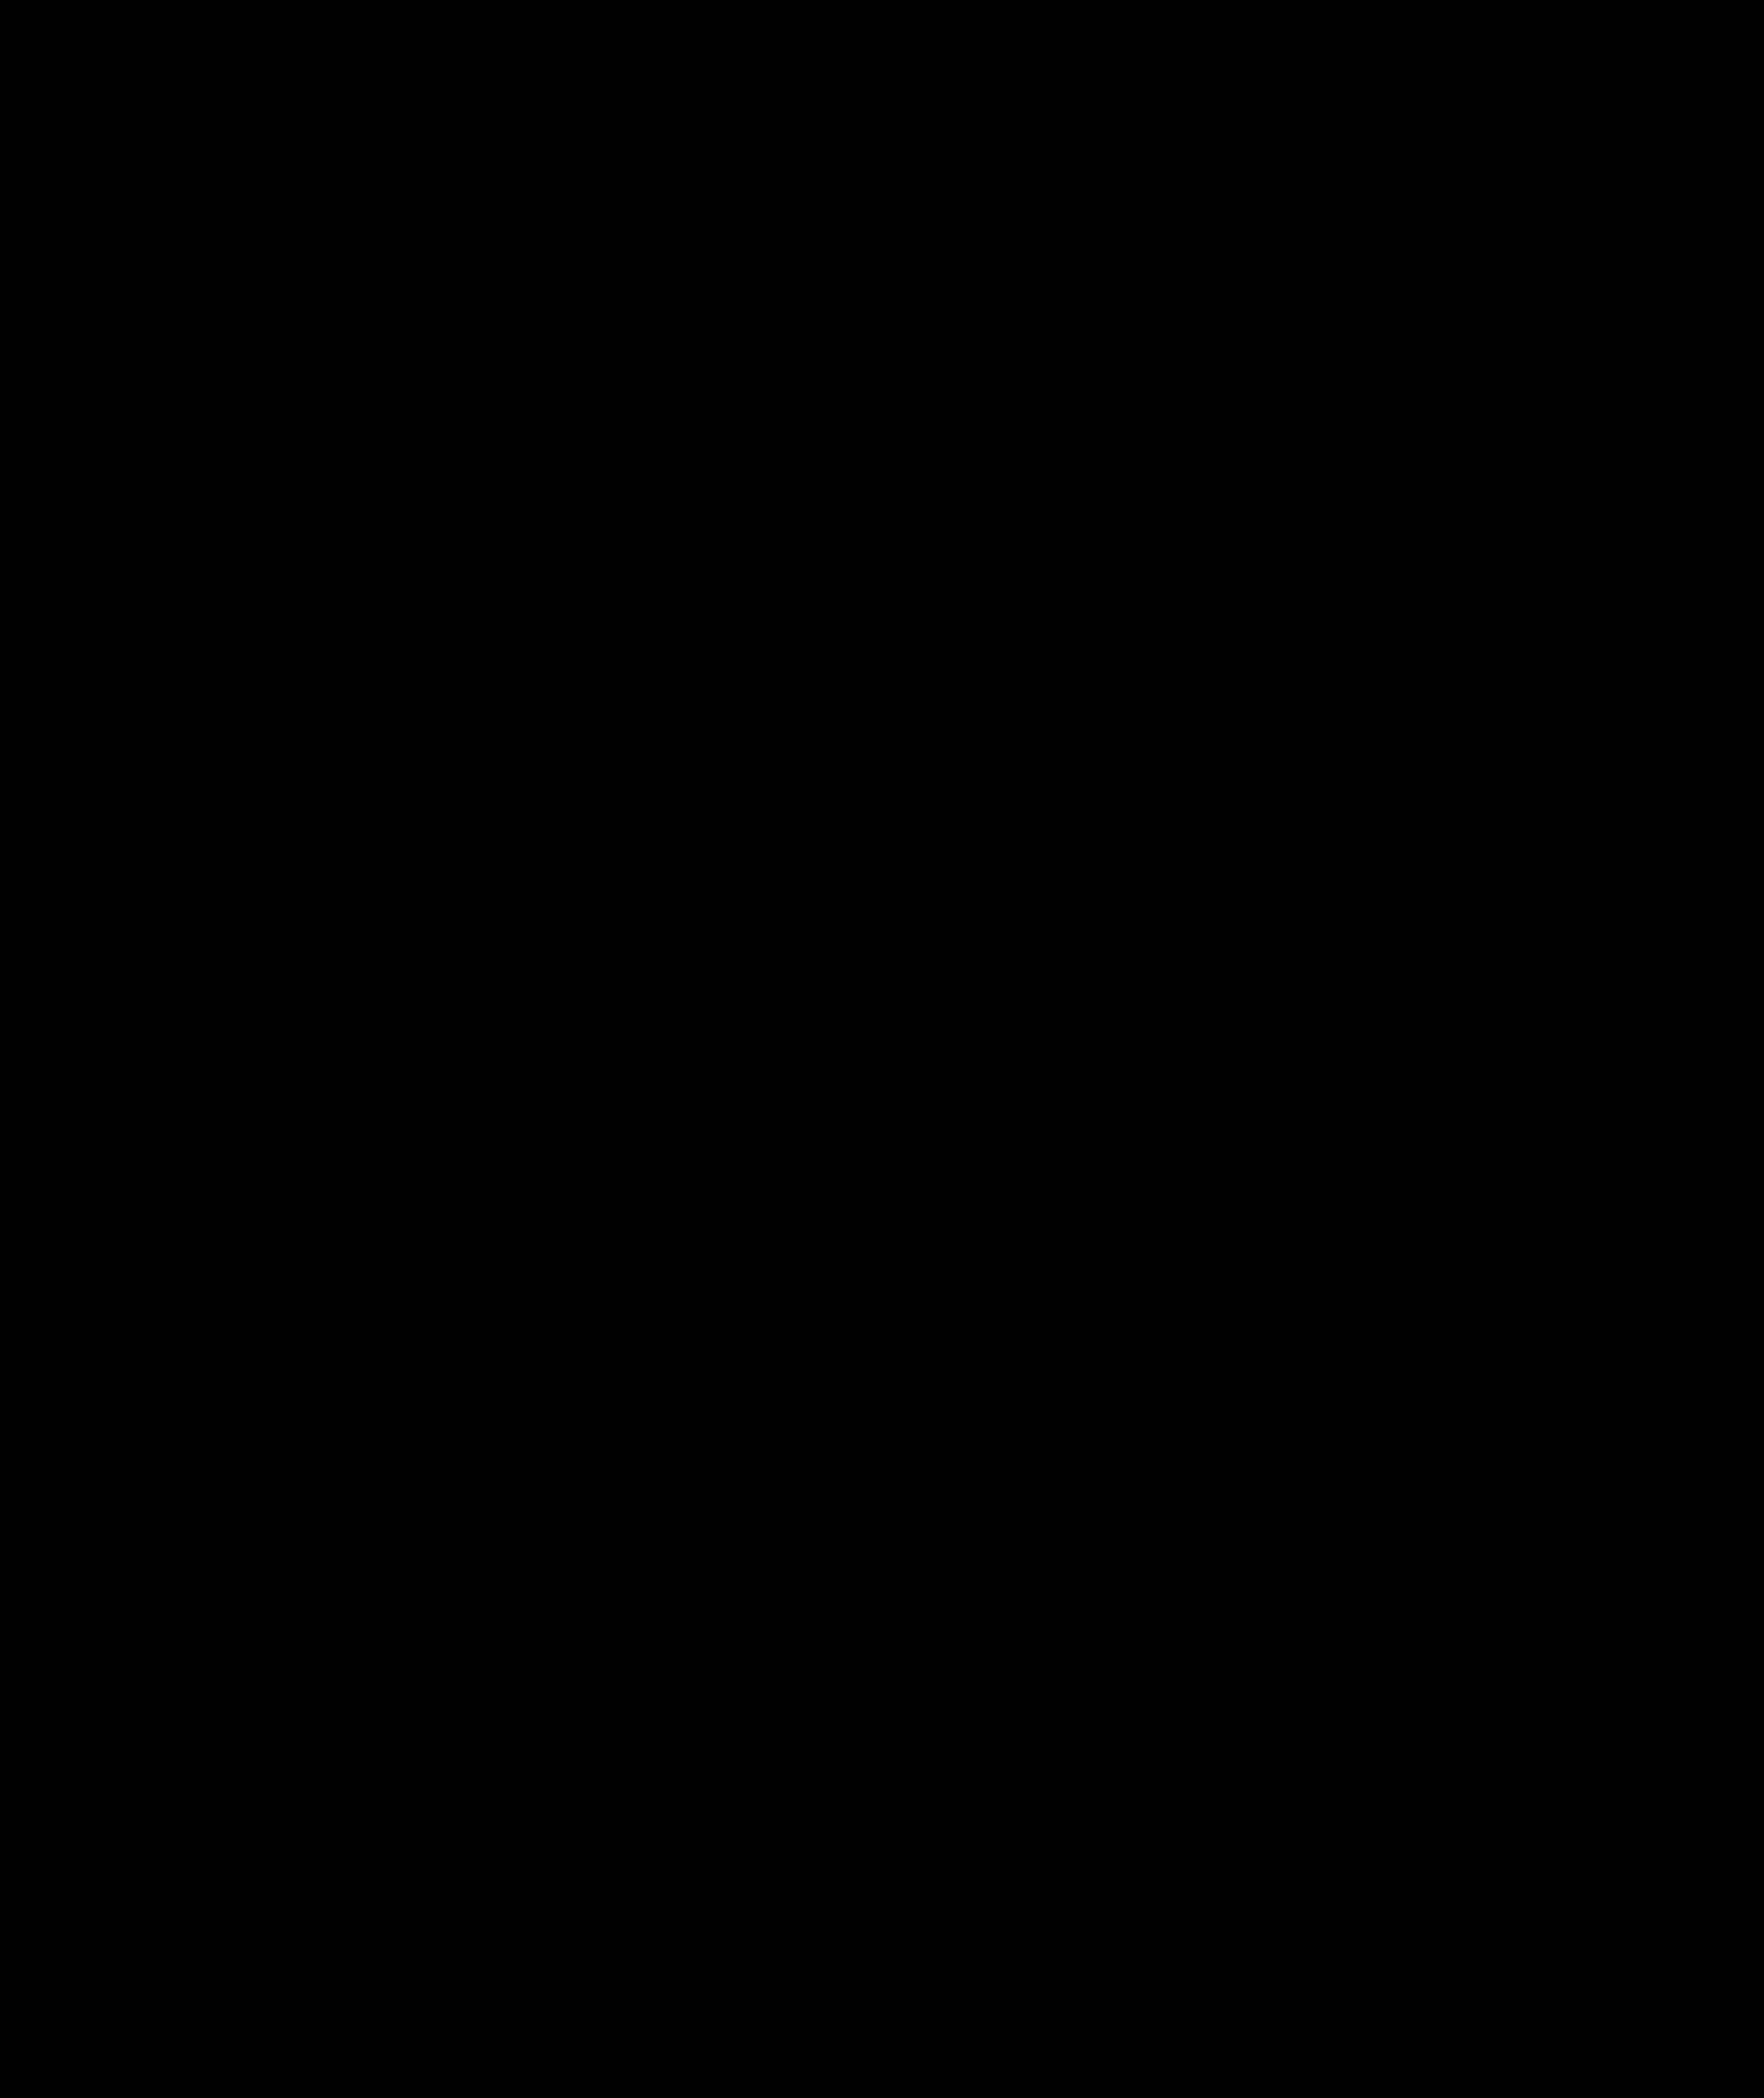 2002x2381 Clipart